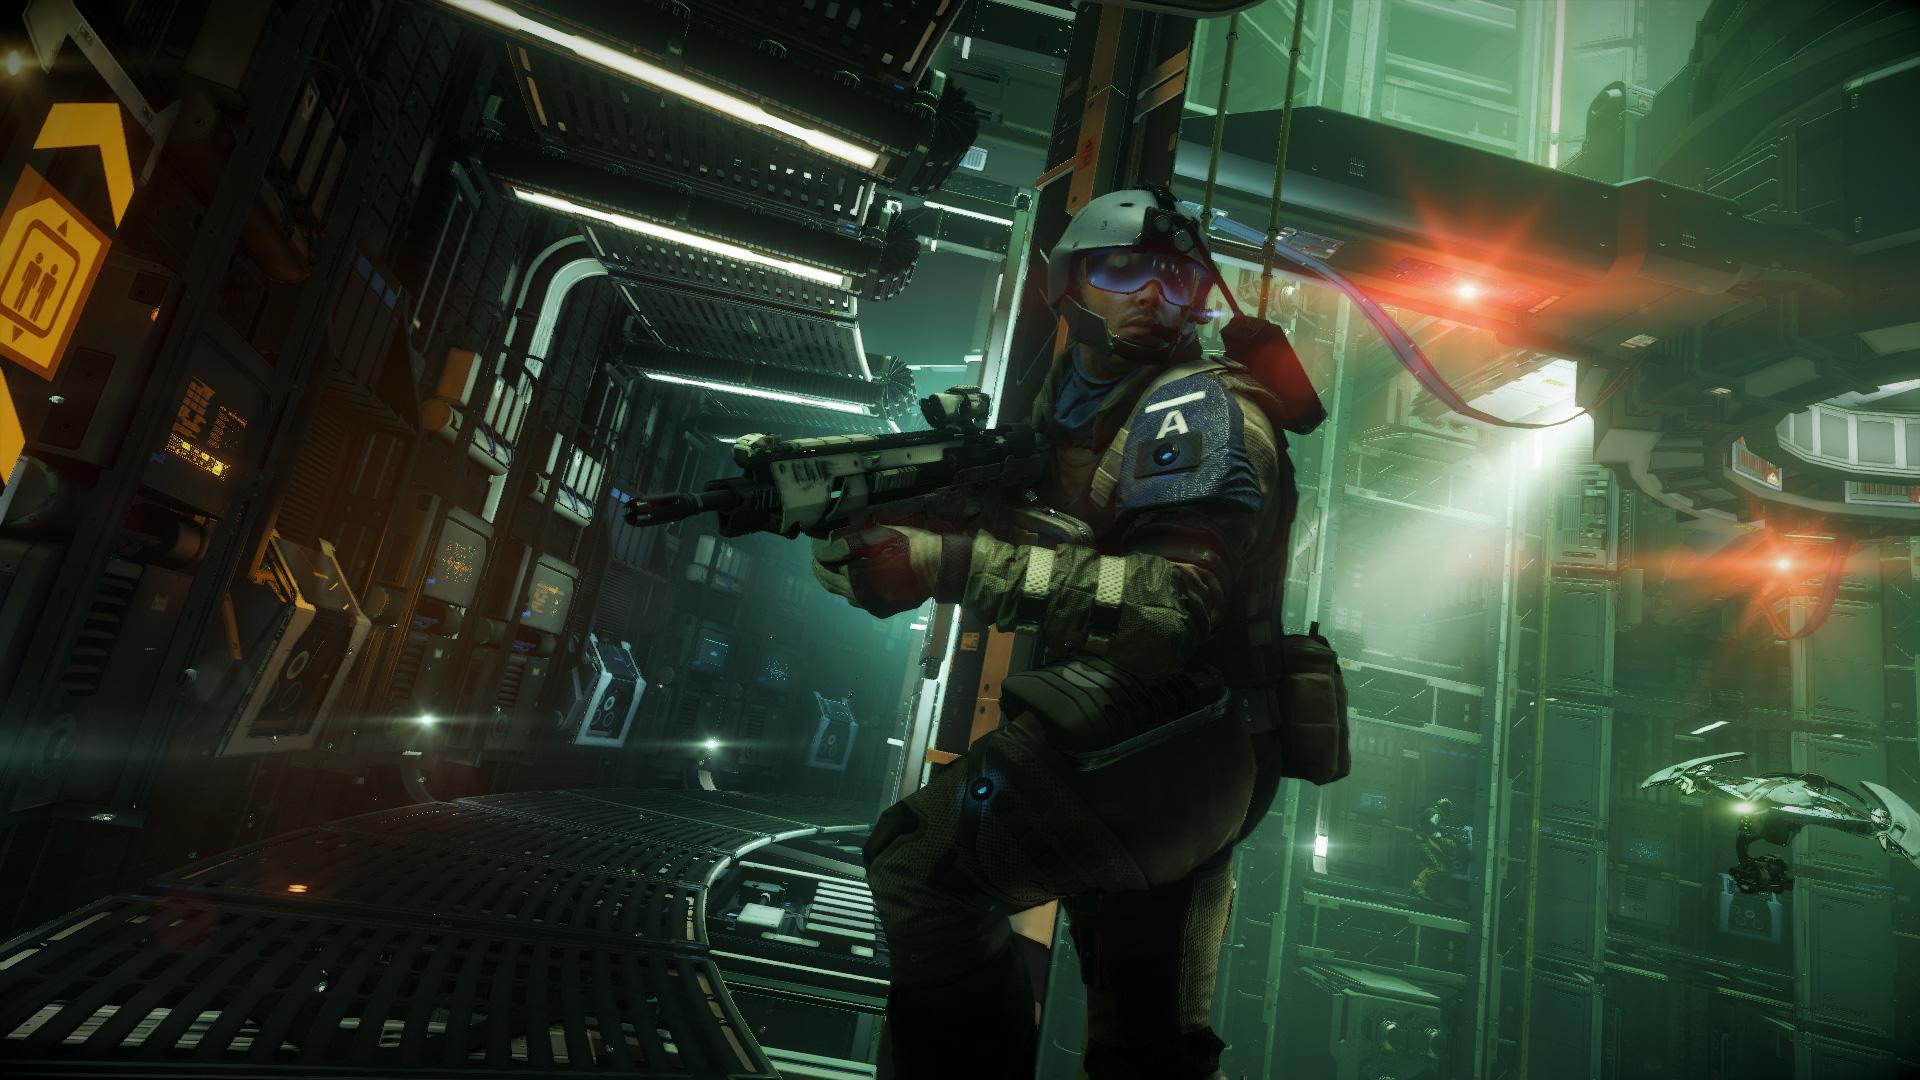 Court dismisses lawsuit surrounding Killzone: Shadow Fall graphics